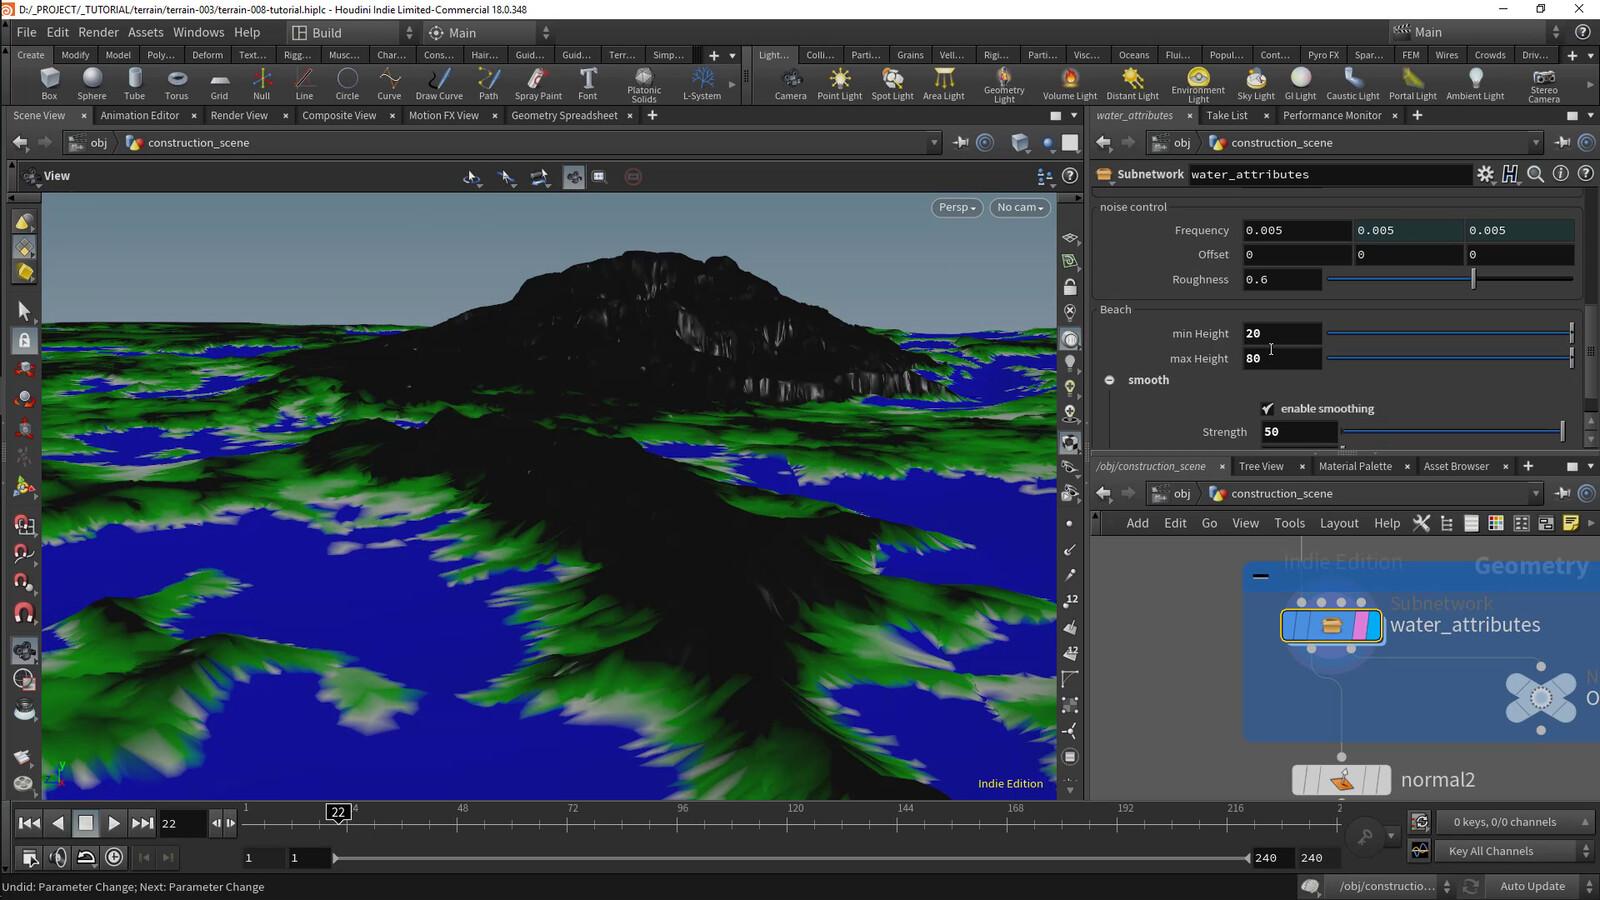 "Screenshot AL_water_attributes tool development, generate ""beach"", ""wetness"" based on water level."